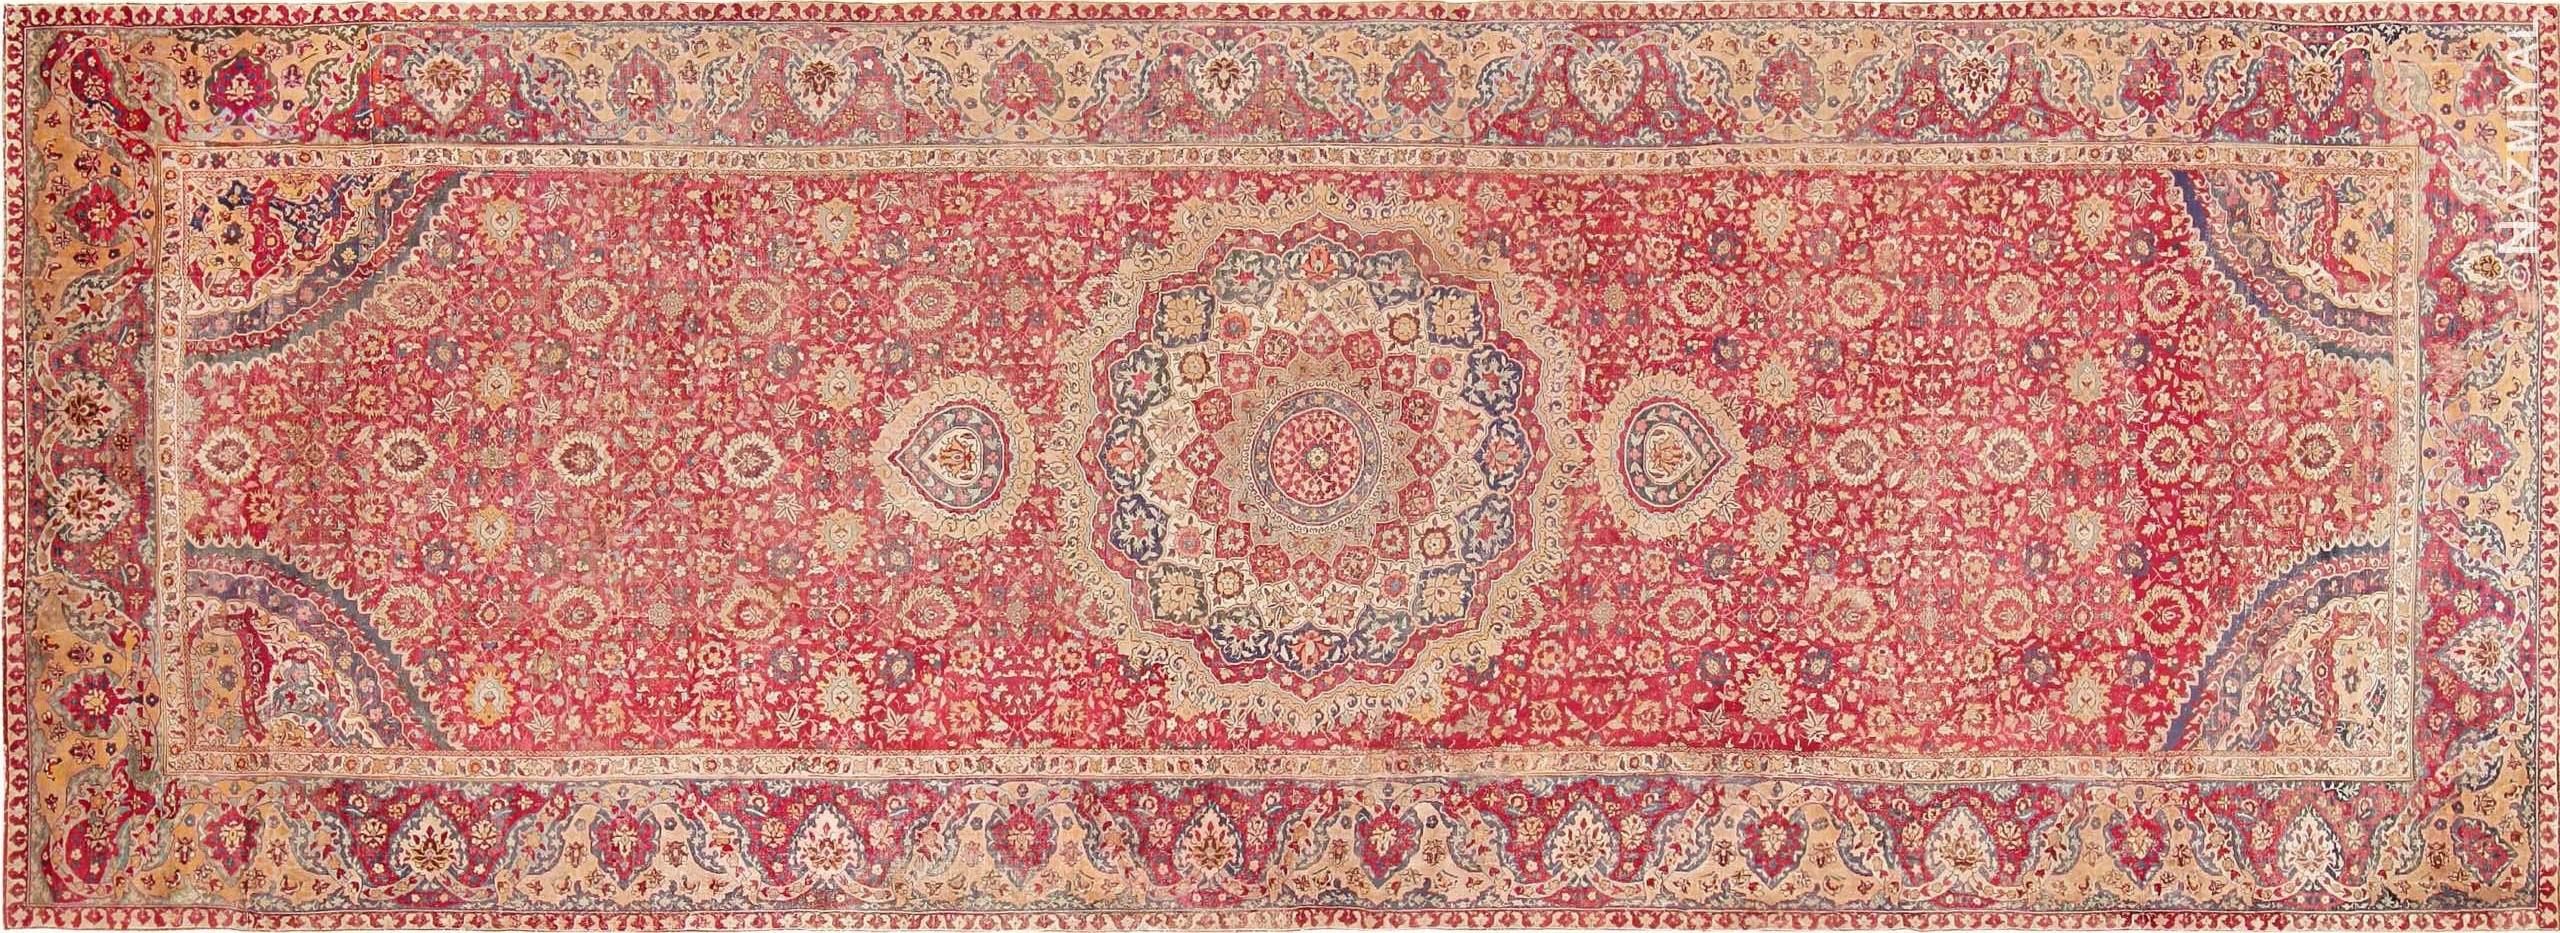 agraandkashmir carpet